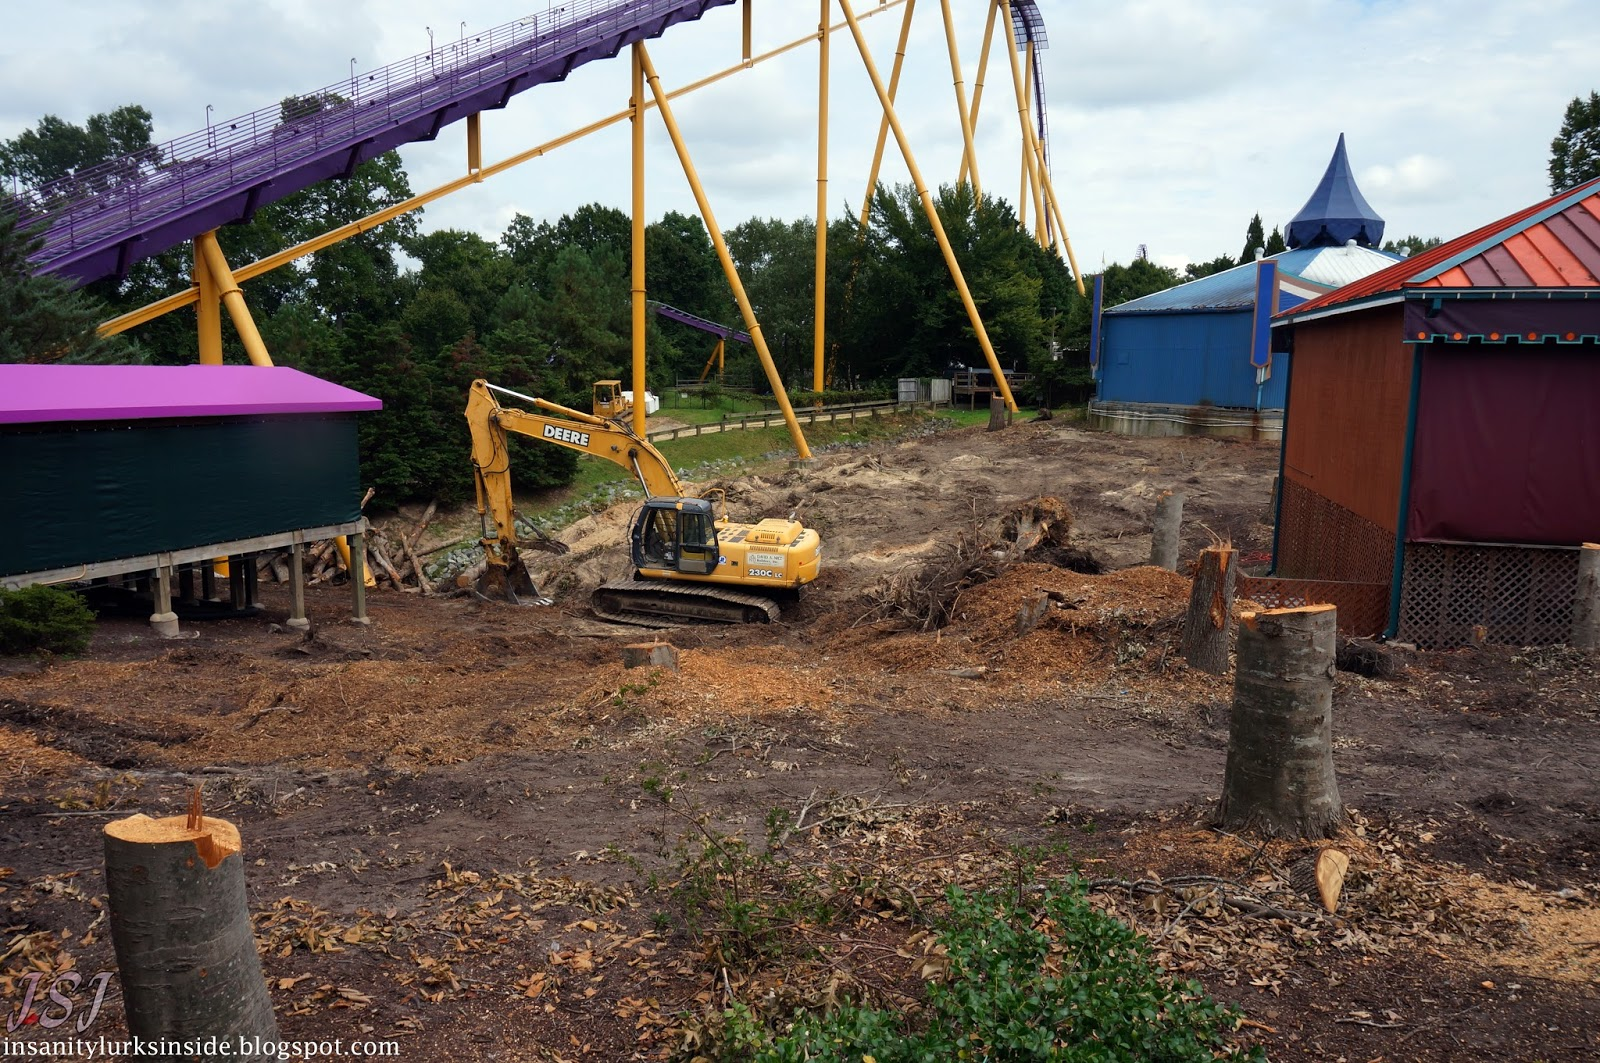 InSanity lurks Inside: Busch Gardens Williamsburg- New Coaster Track ...